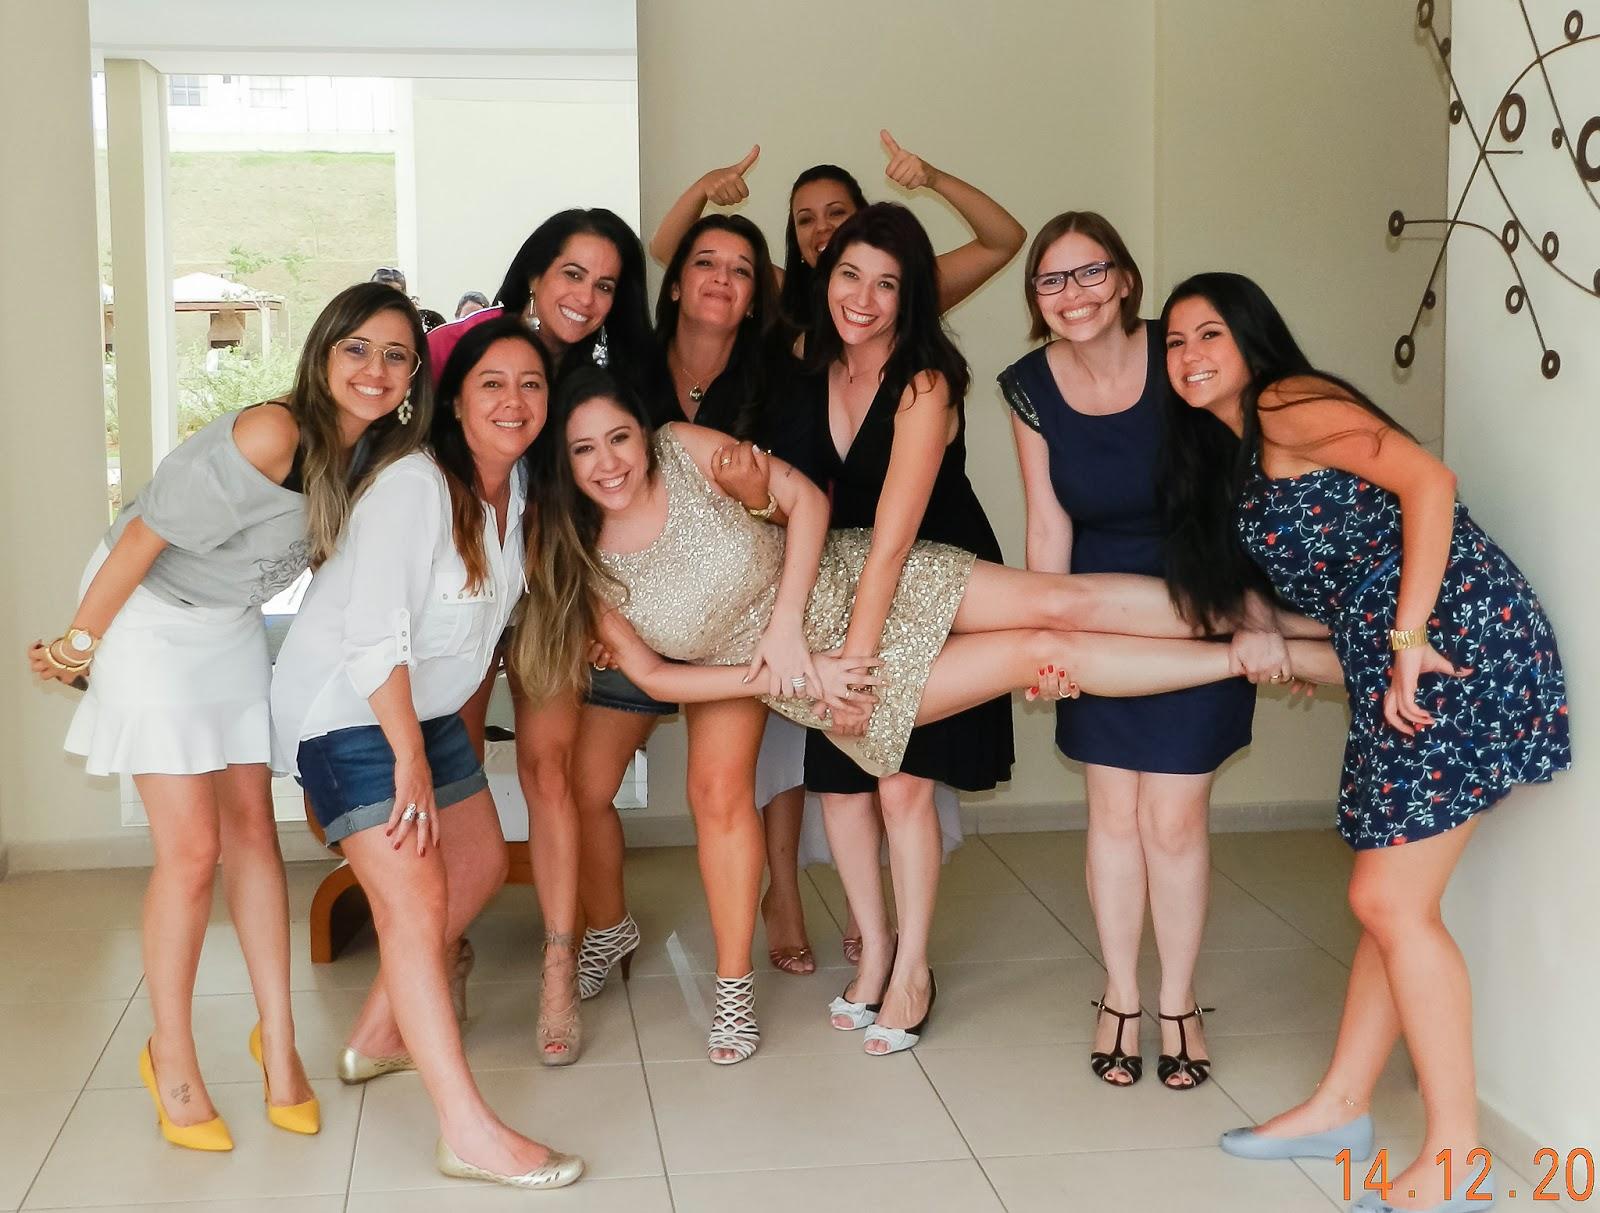 cha-lingerie-noiva-amigas-7